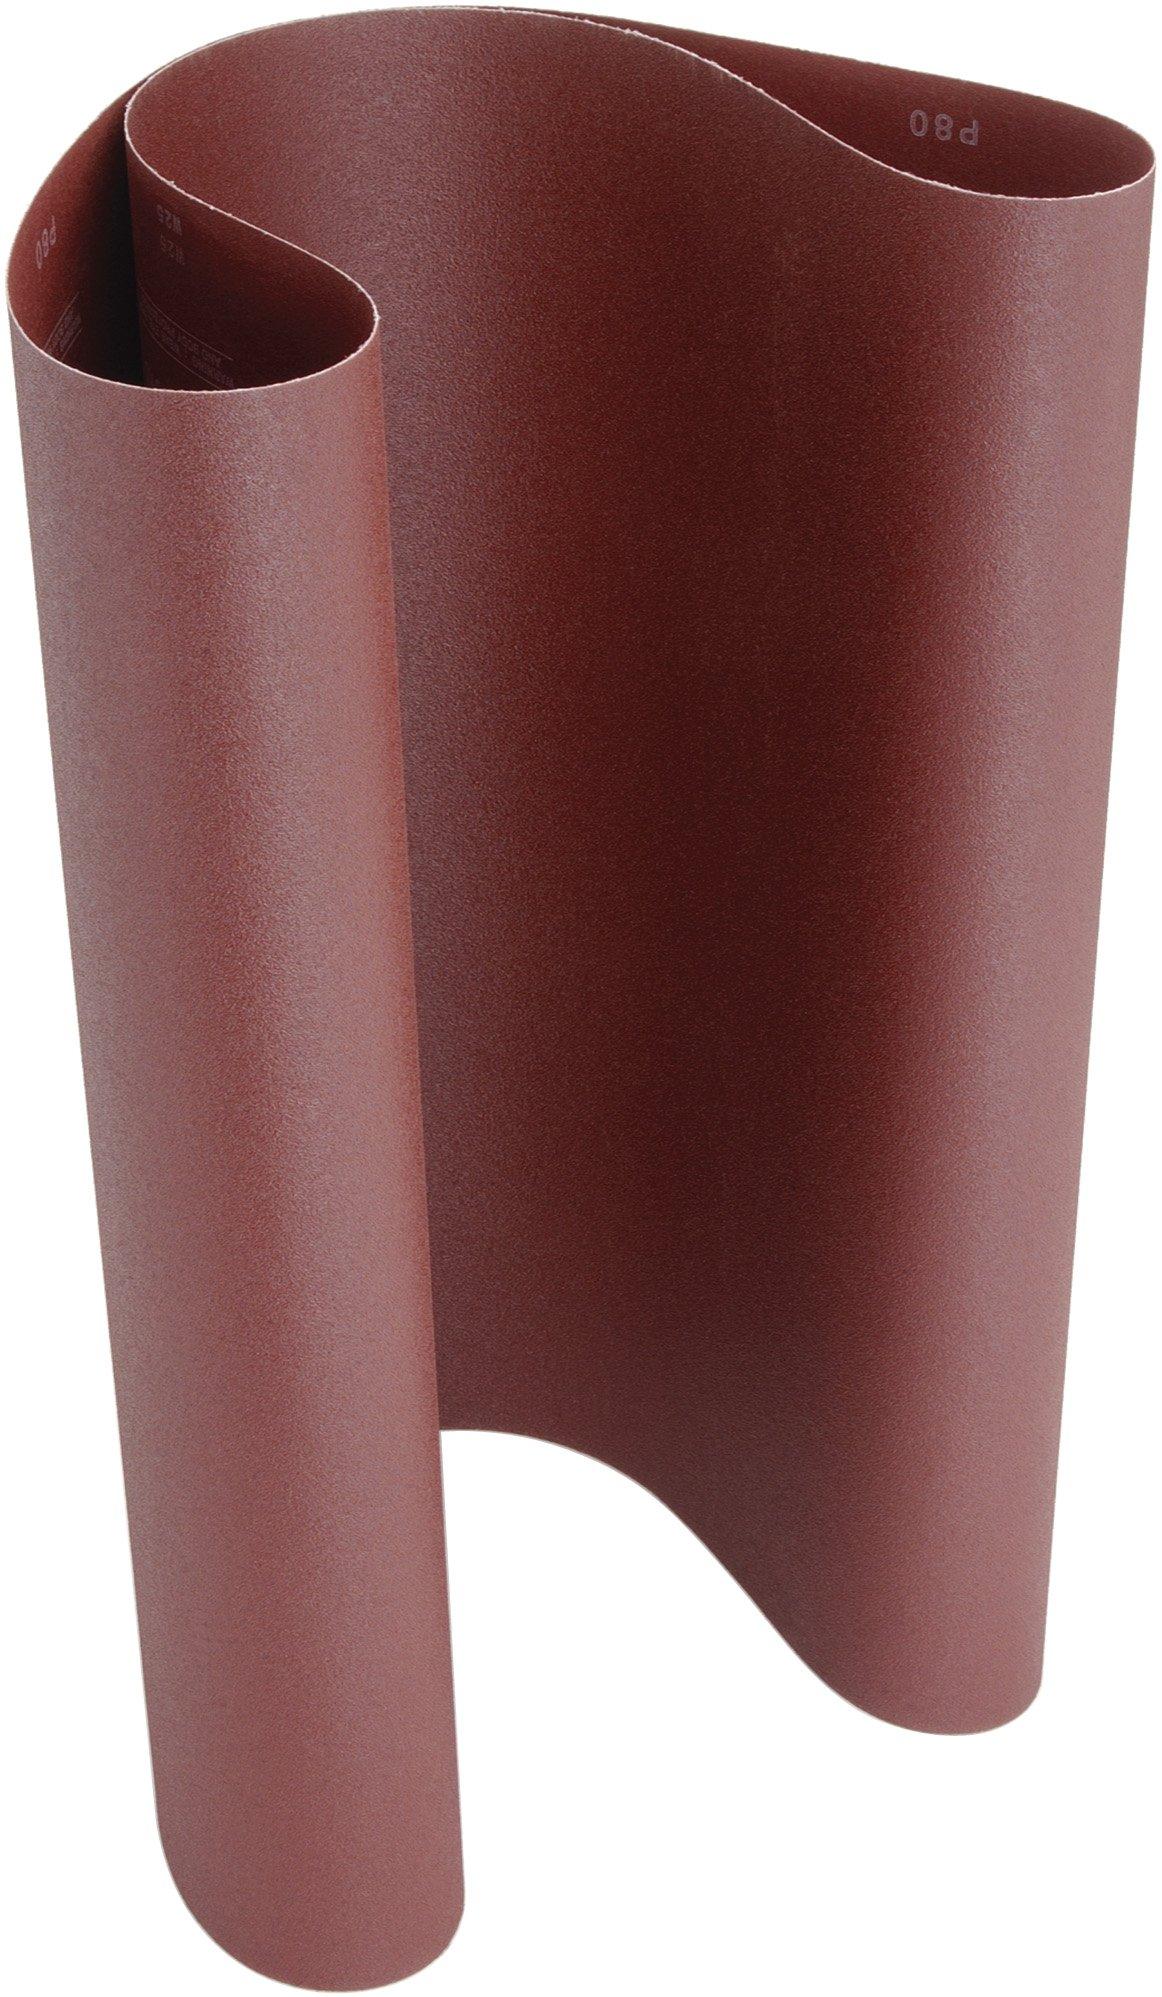 Steelex D3306 20-1/2-Inch by 48-Inch Aluminum Oxide Sanding Belt, 80 Grit